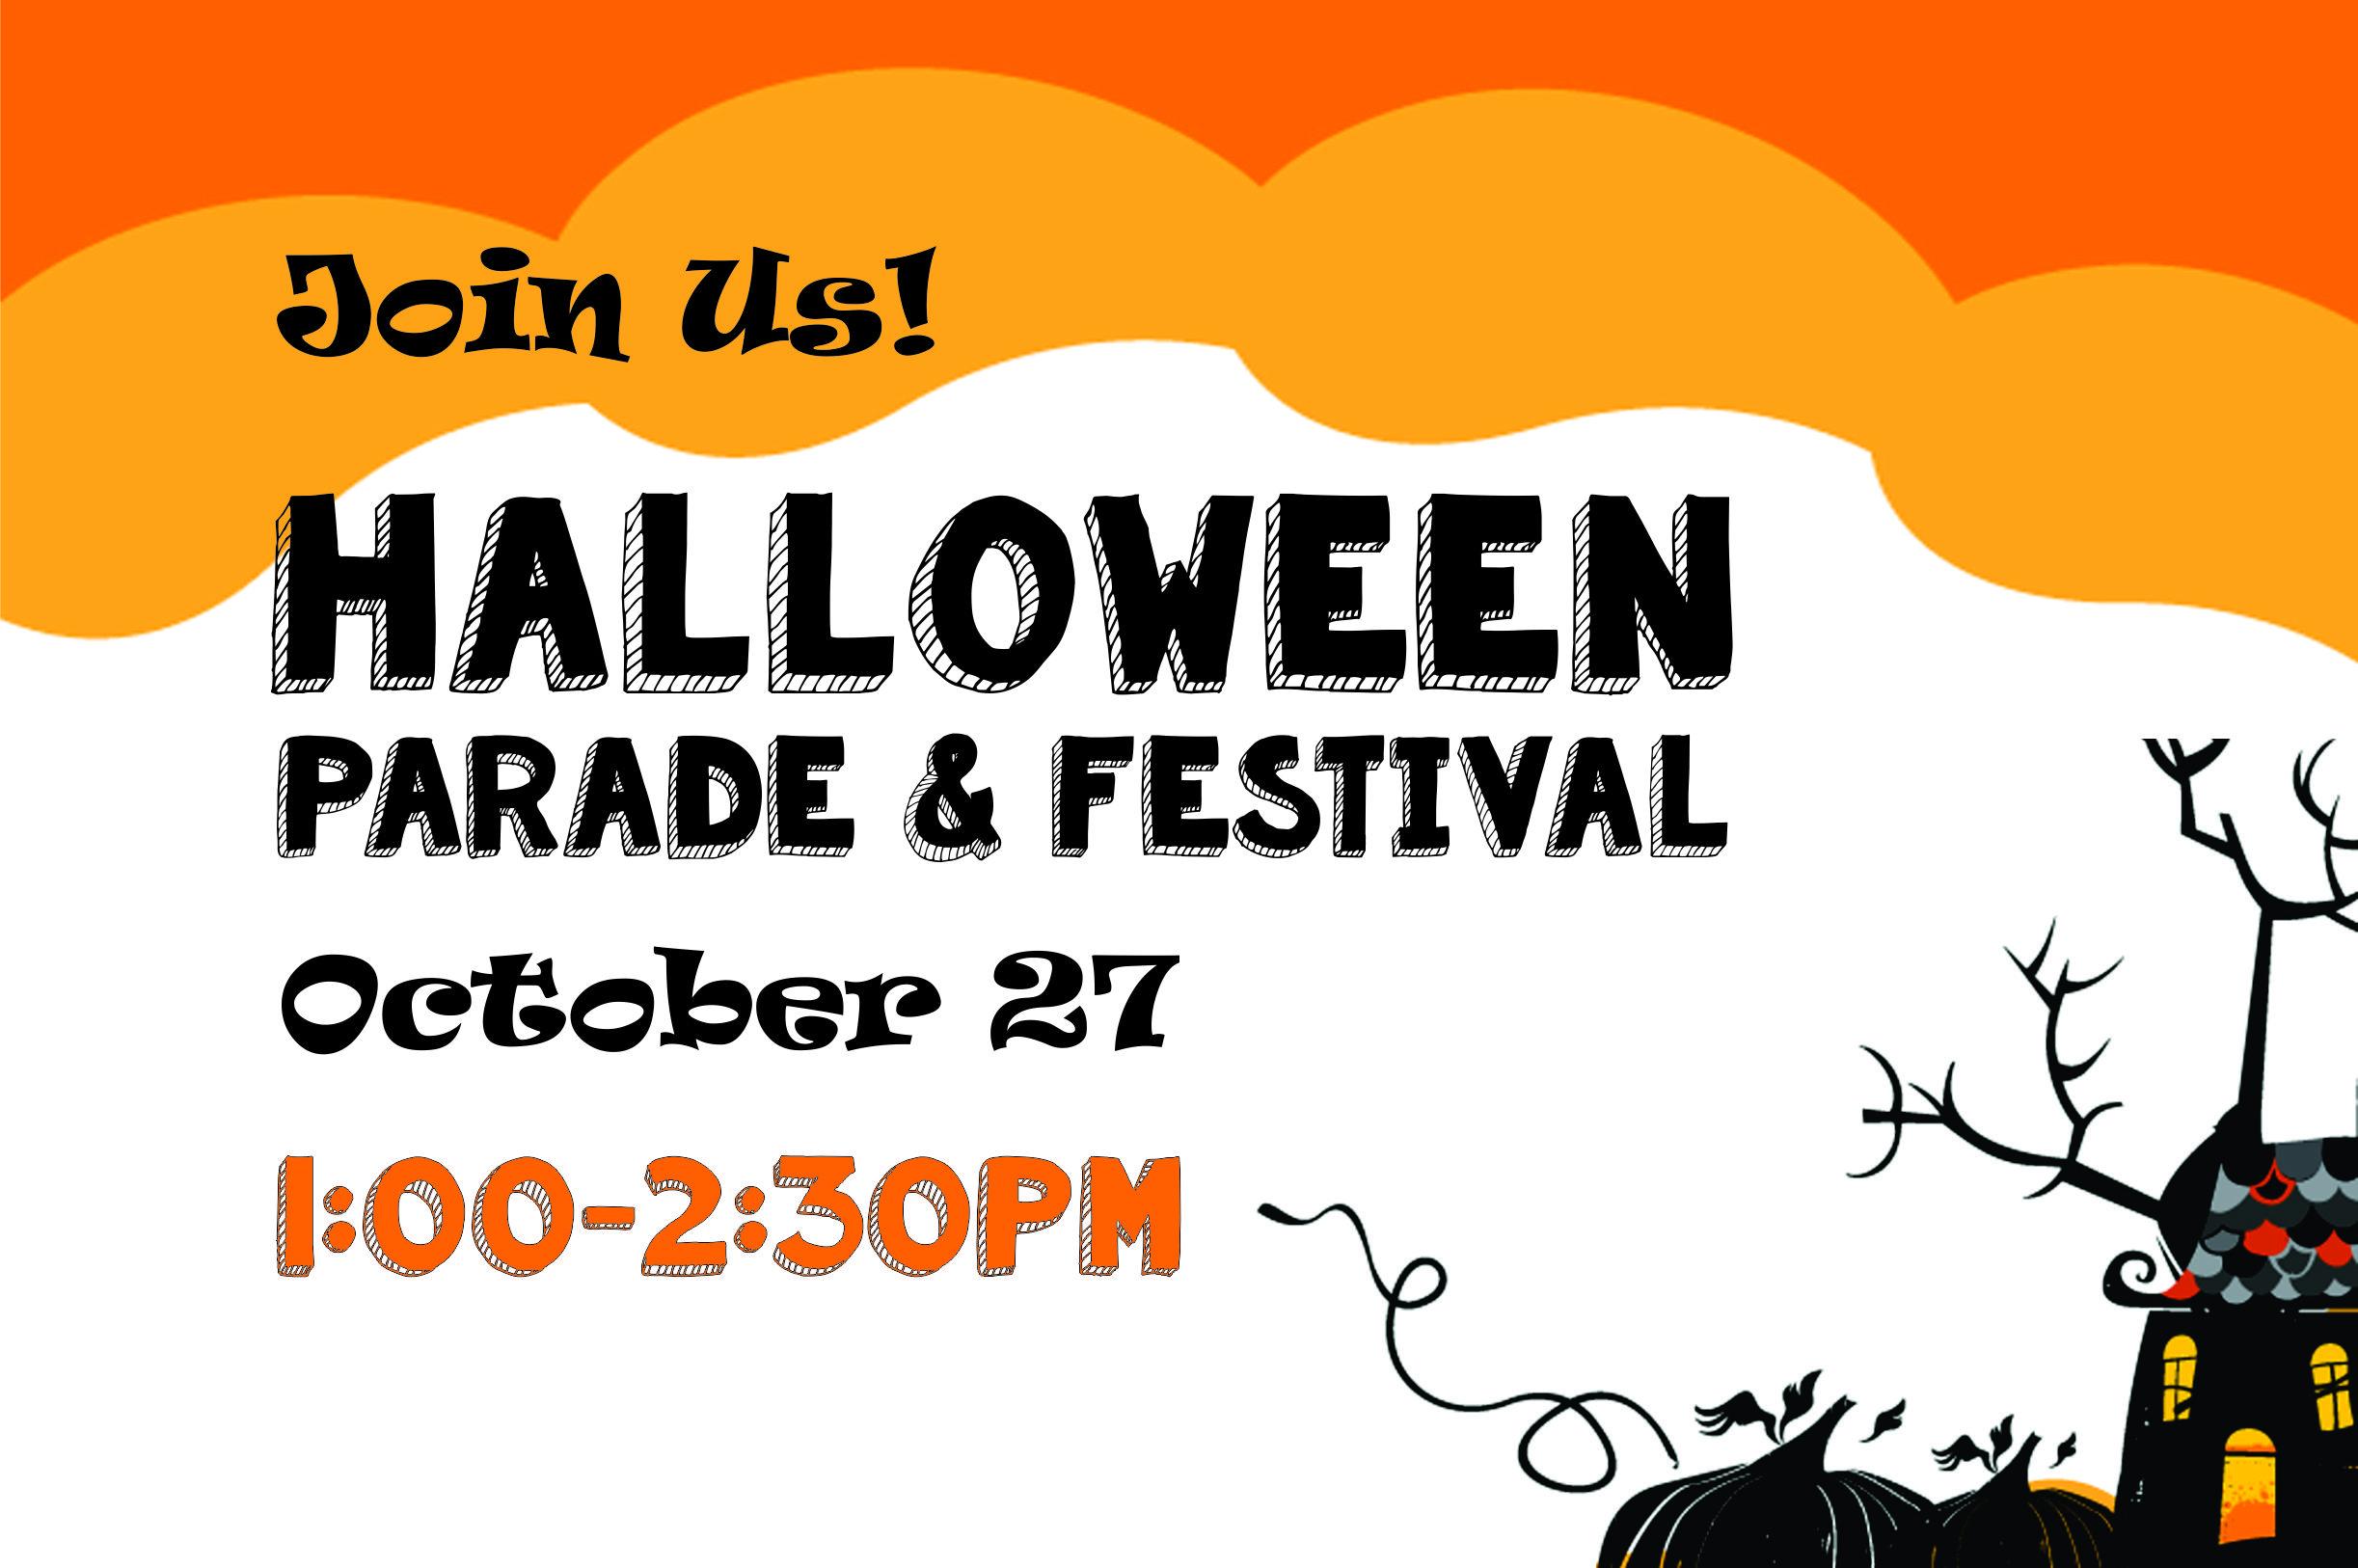 Halloween Parade & Festival